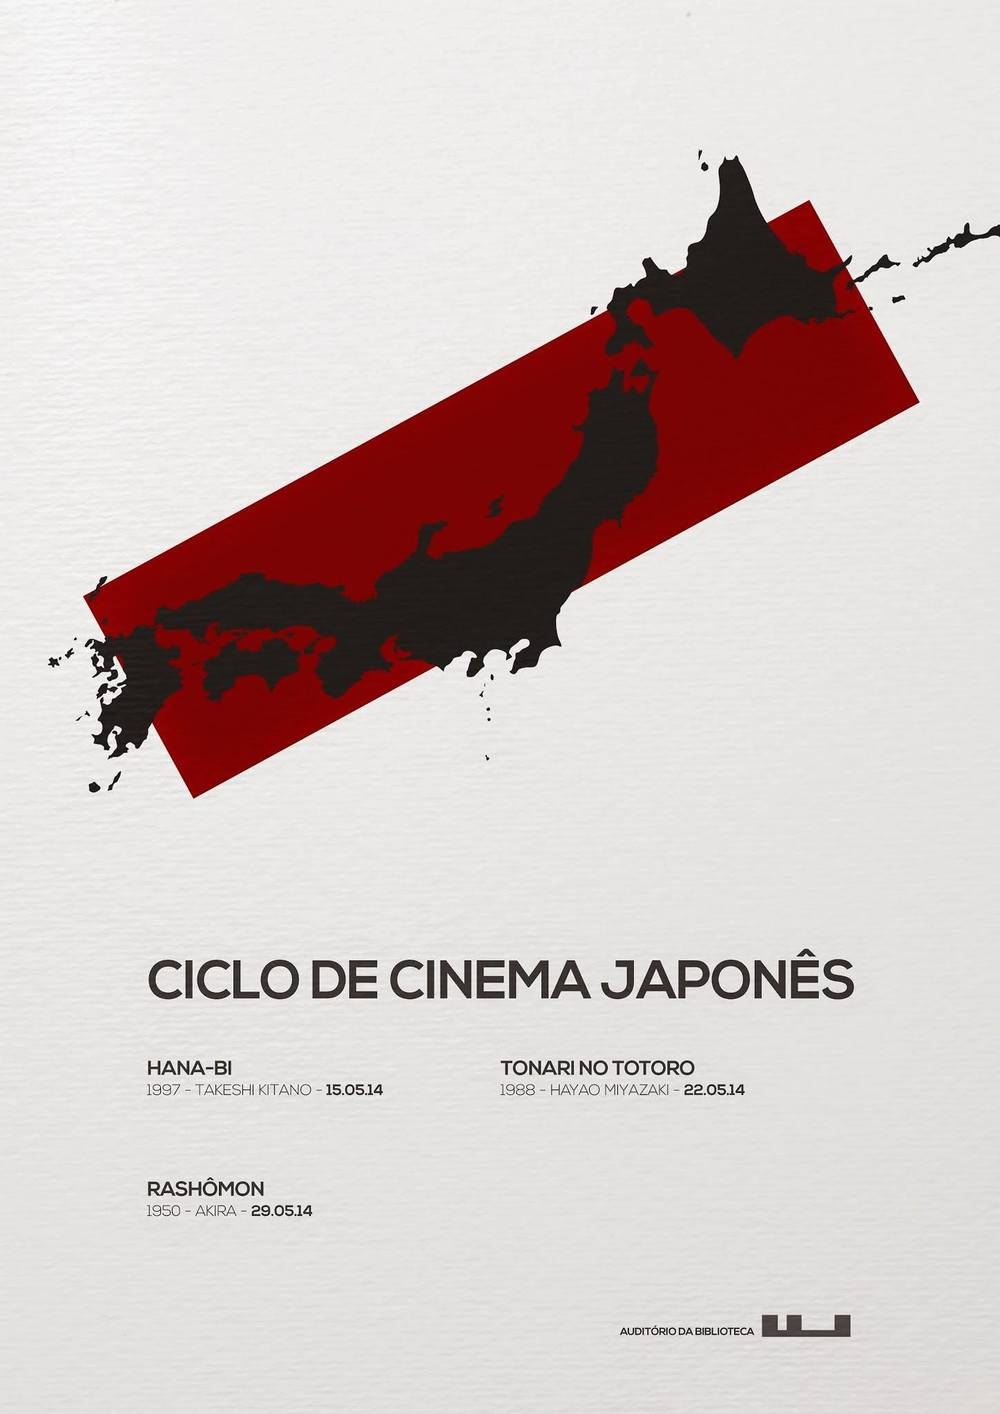 Ciclo de Cinema Japonês